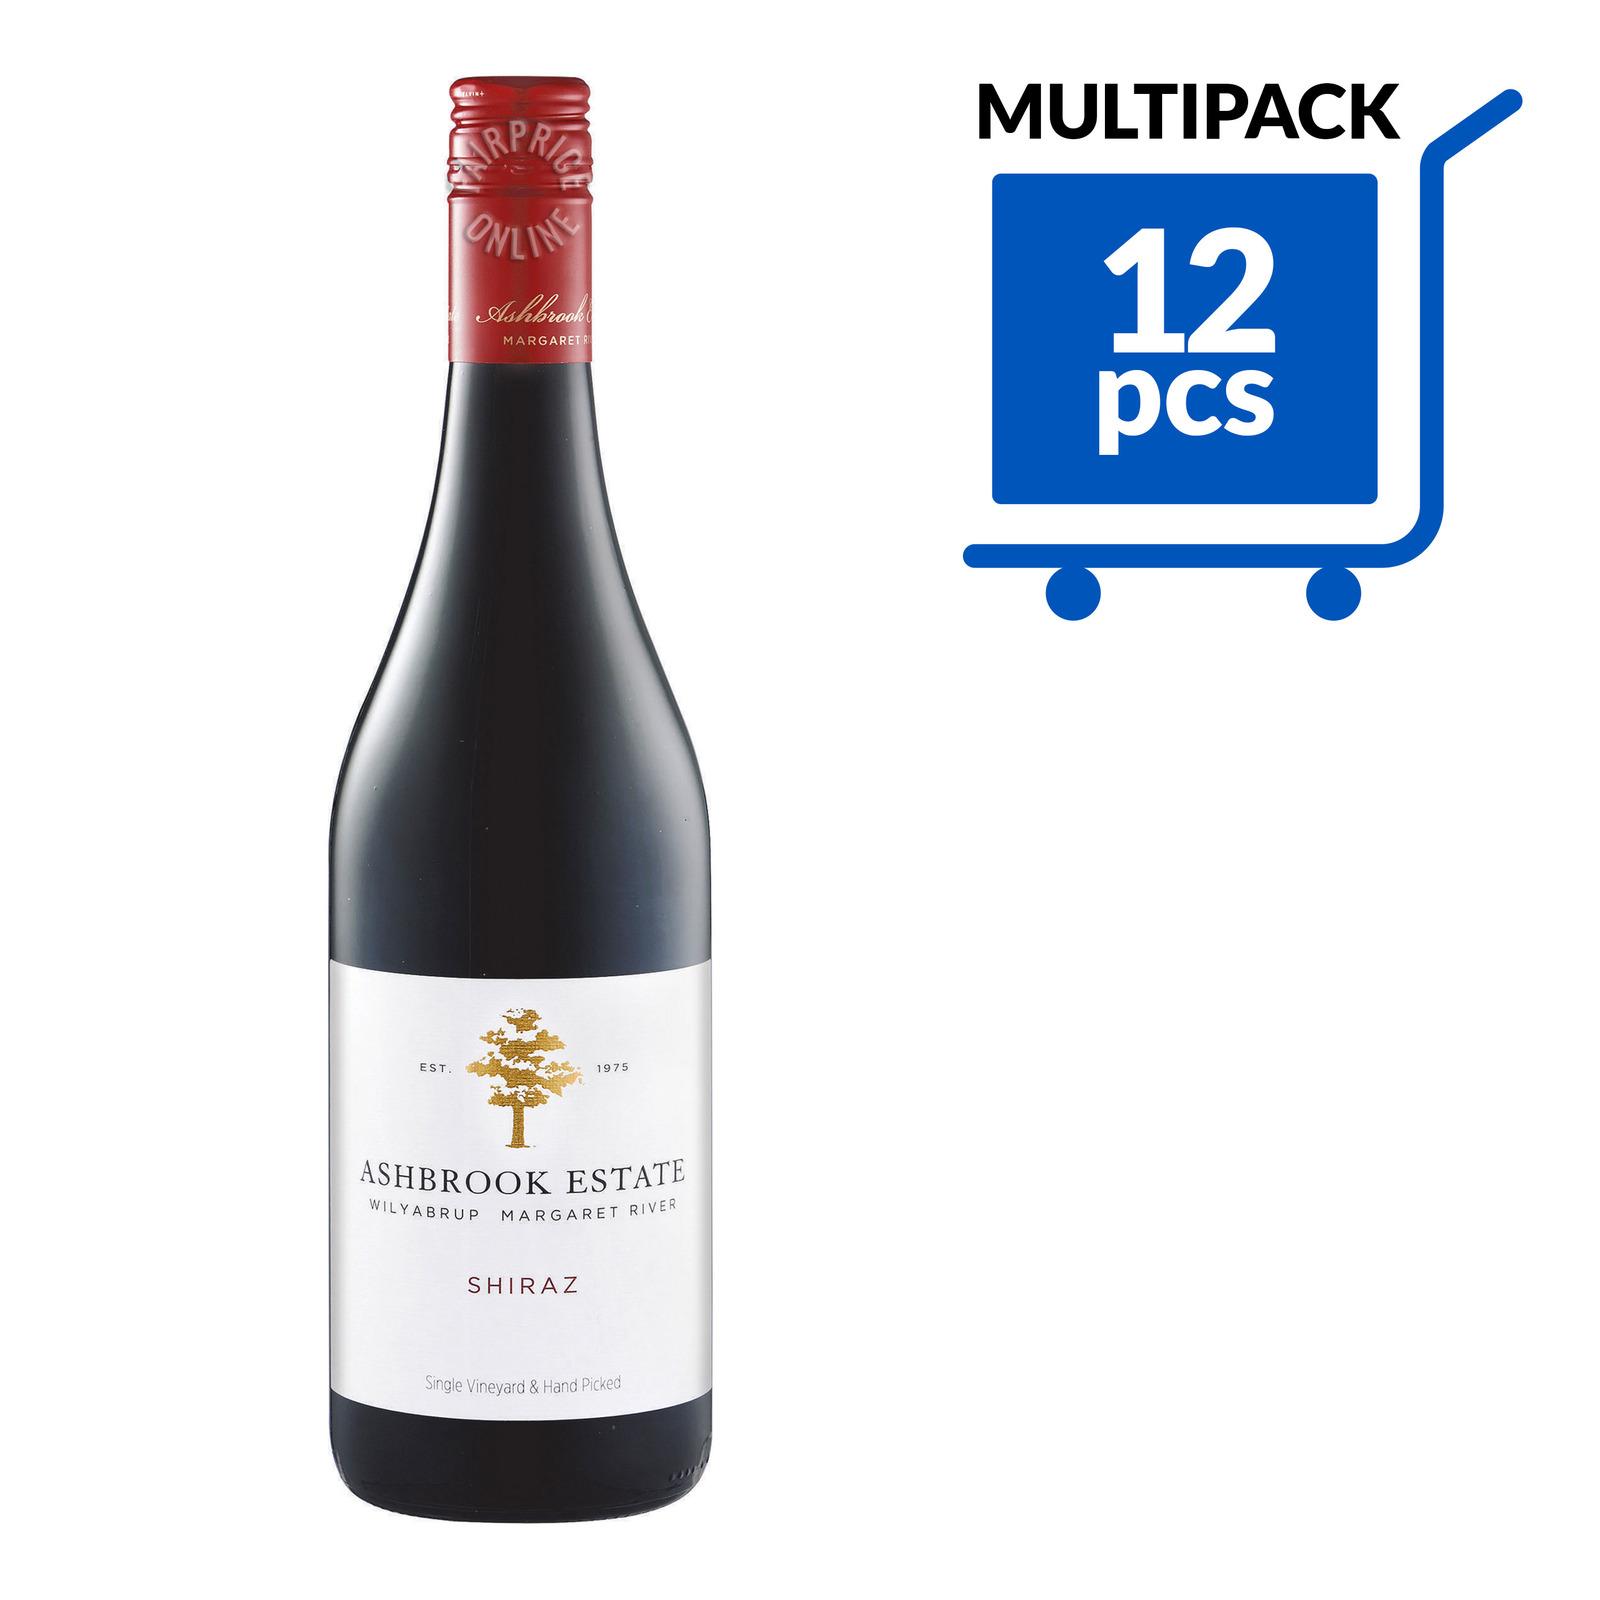 Ashbrook Estate Red Wine - Shiraz